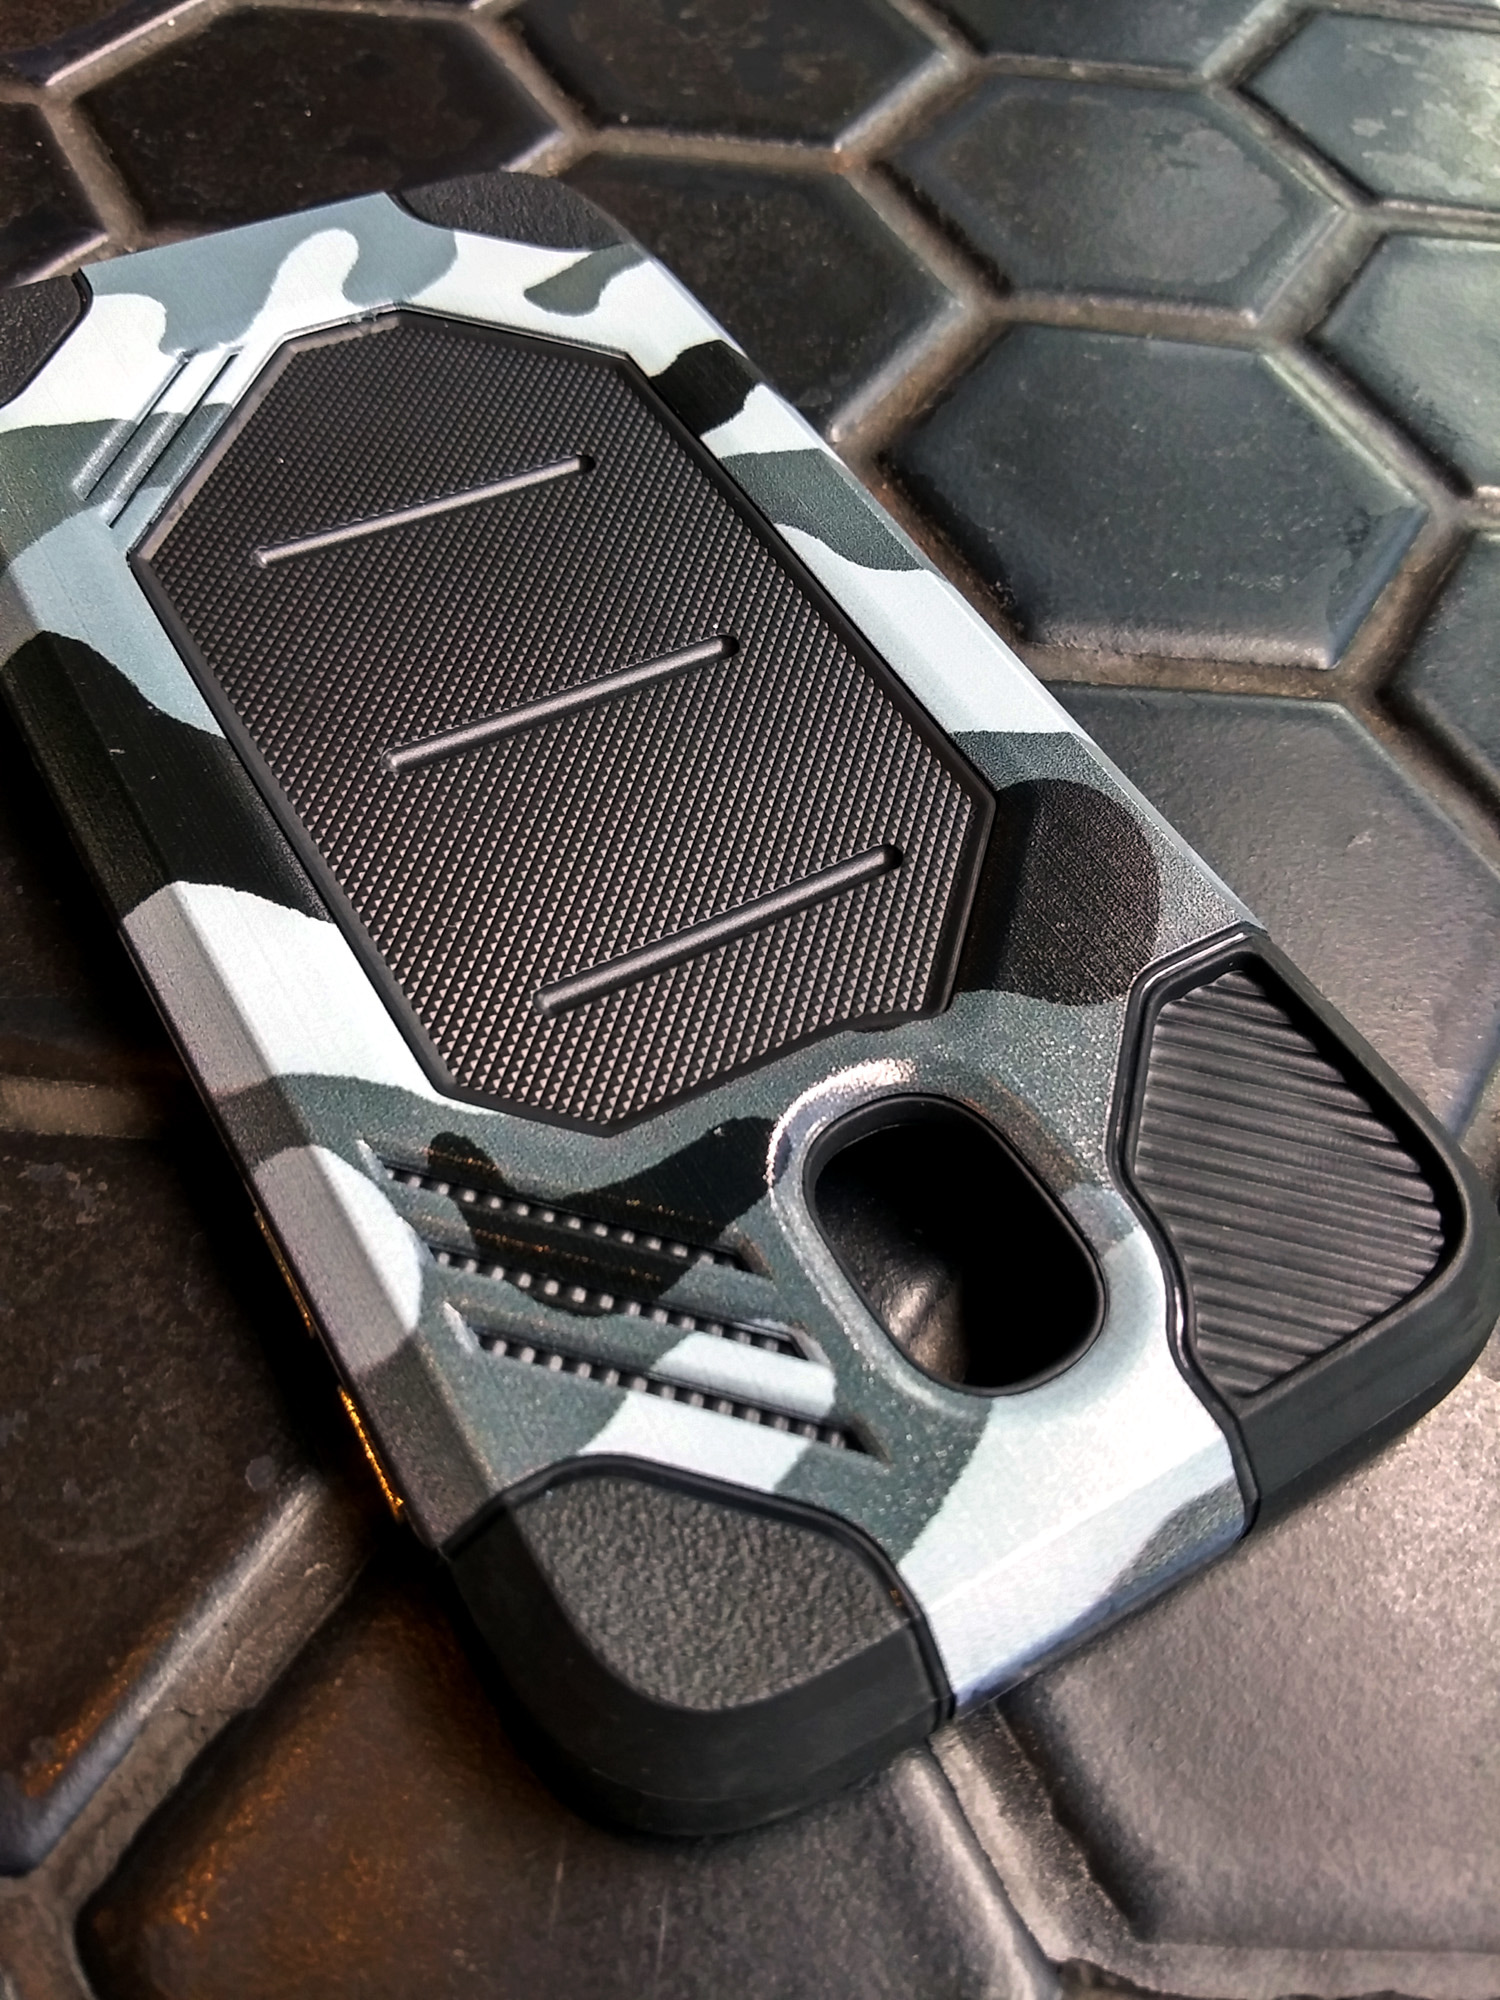 Samsung J7 Pro 2017 Army Military Sport Tech Armor Soft TPU Case